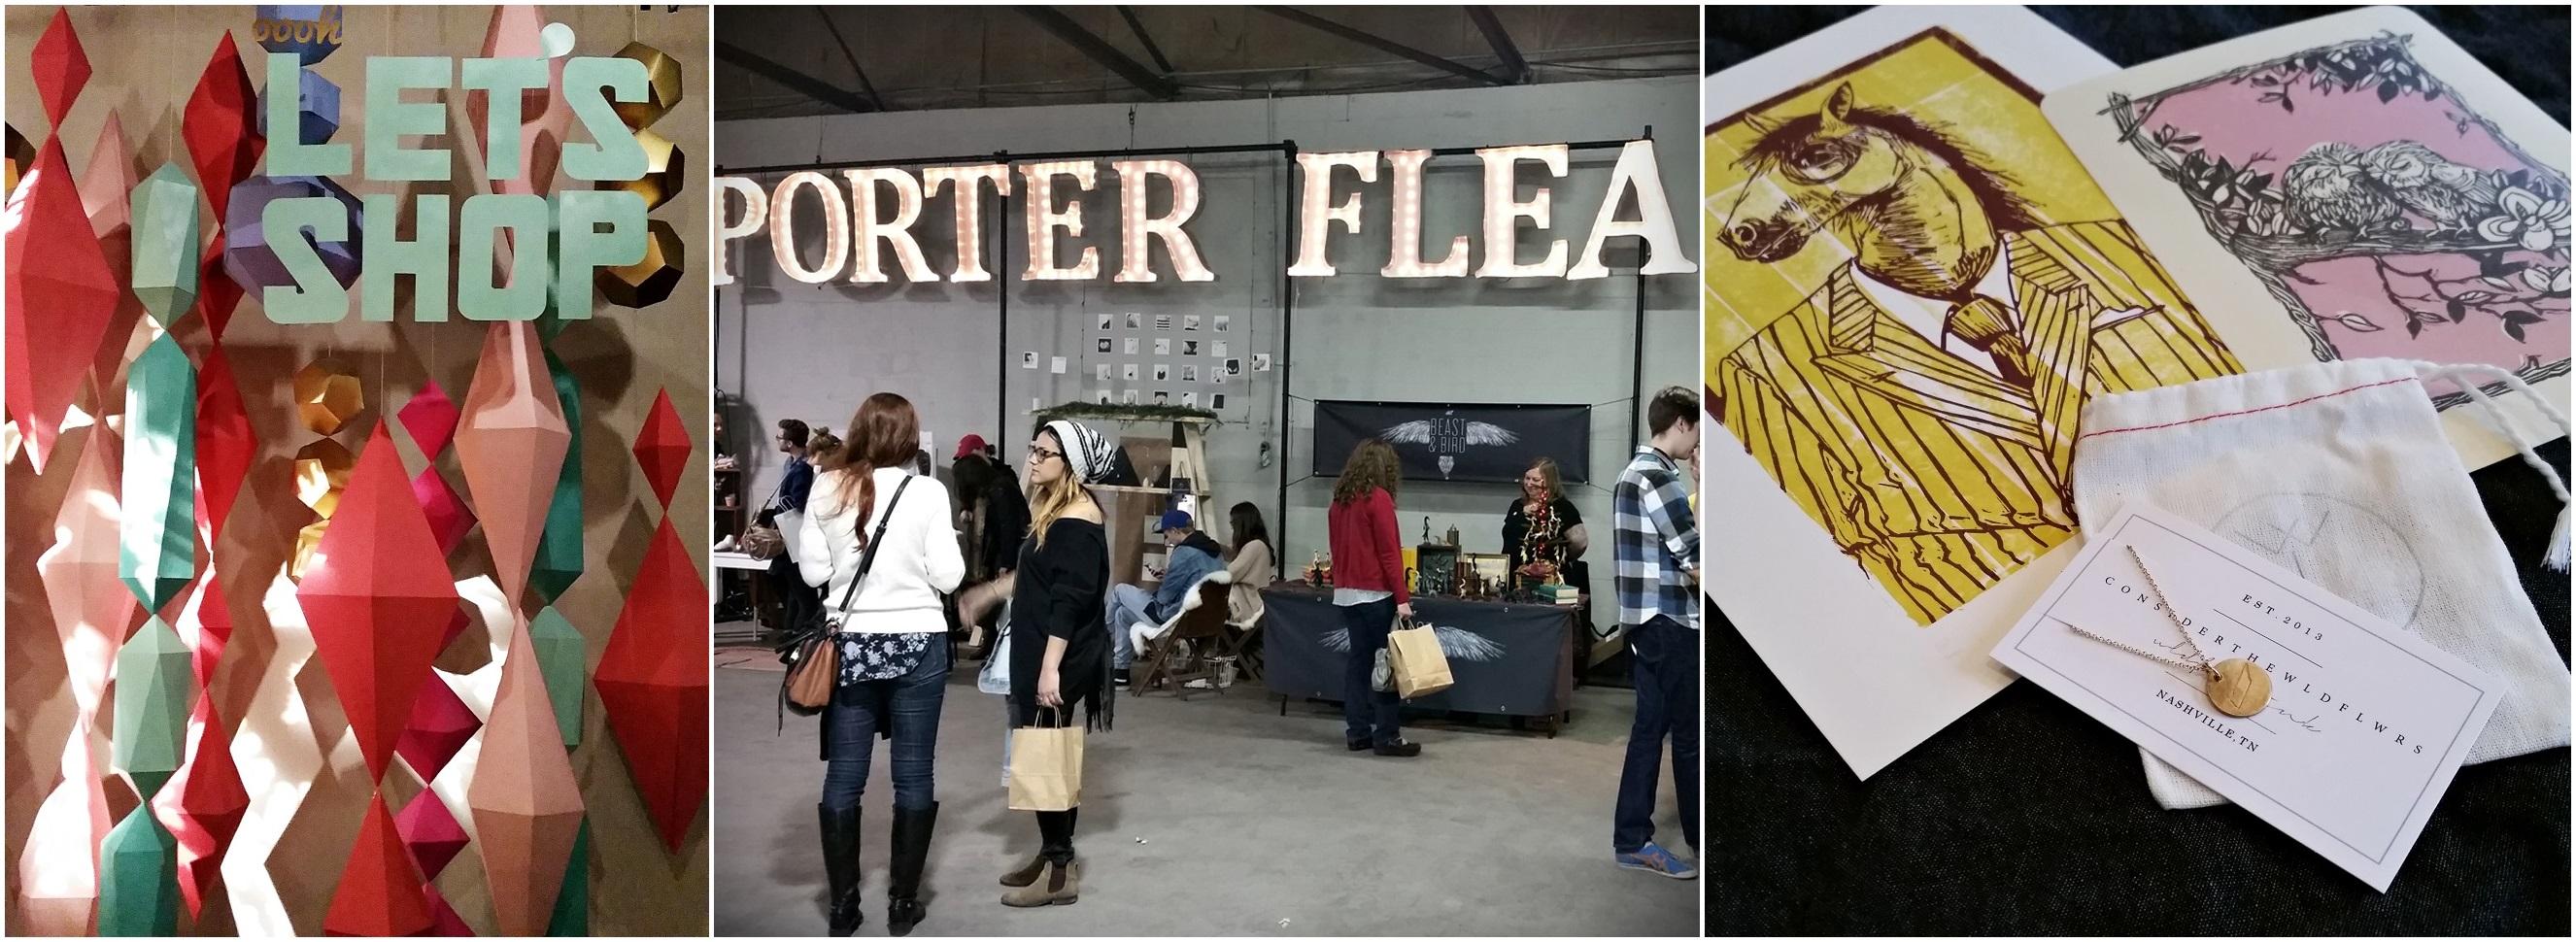 Porter Flea-tile